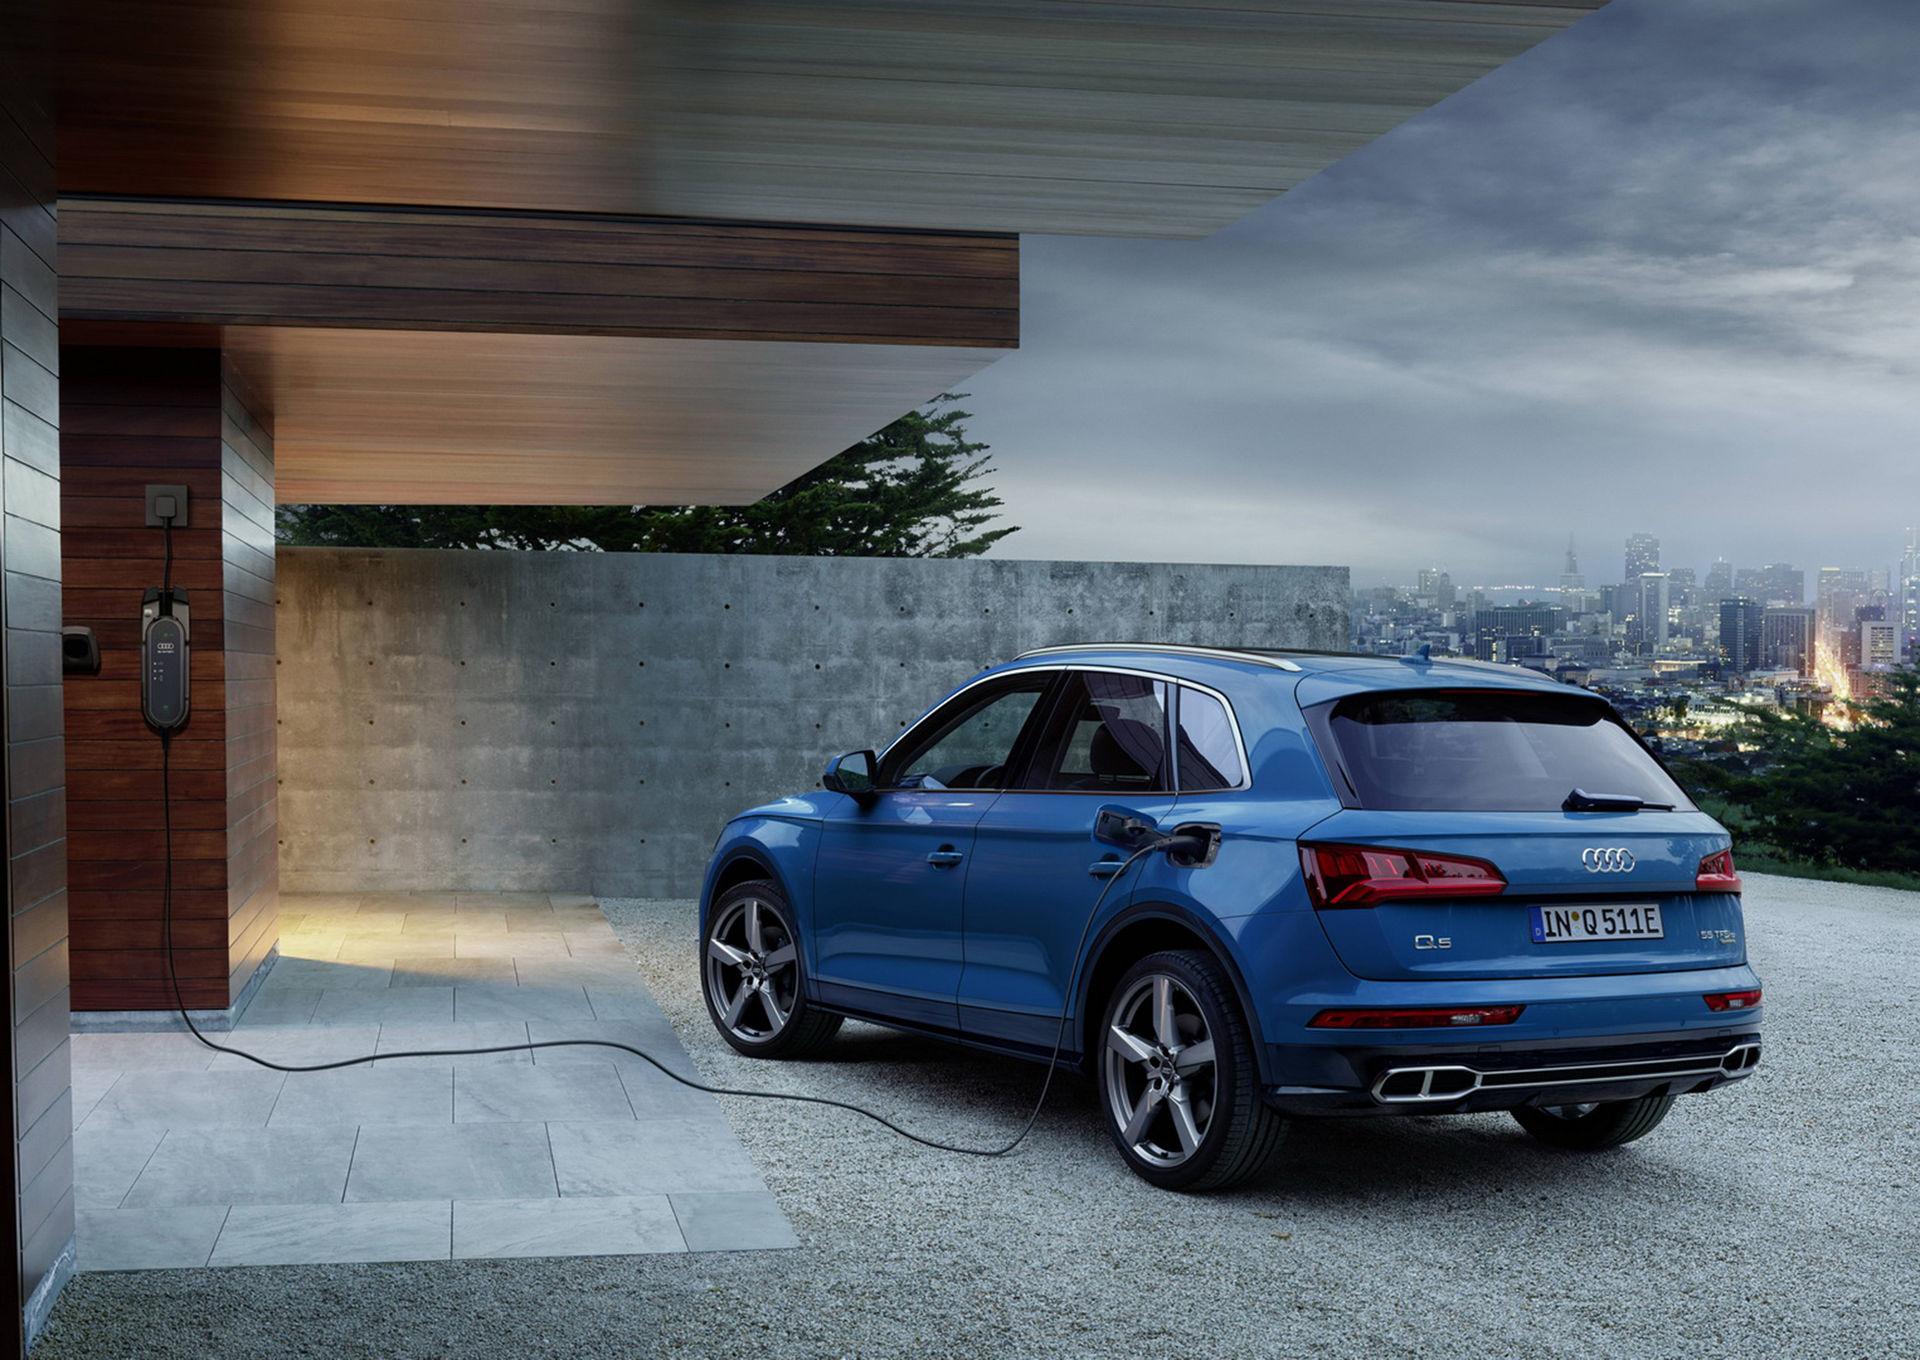 Audi Q5 nu som laddhybrid